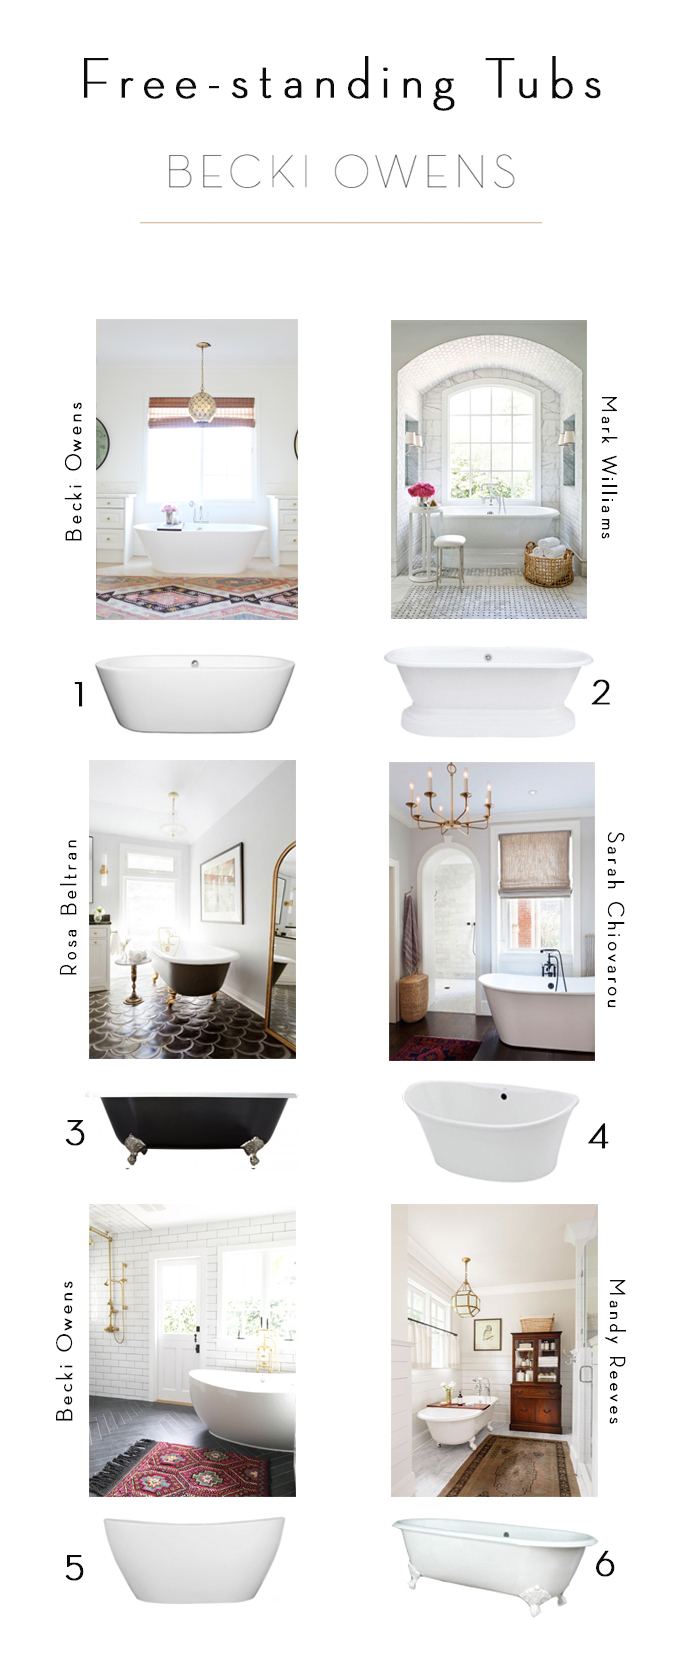 freestanding tub ideas